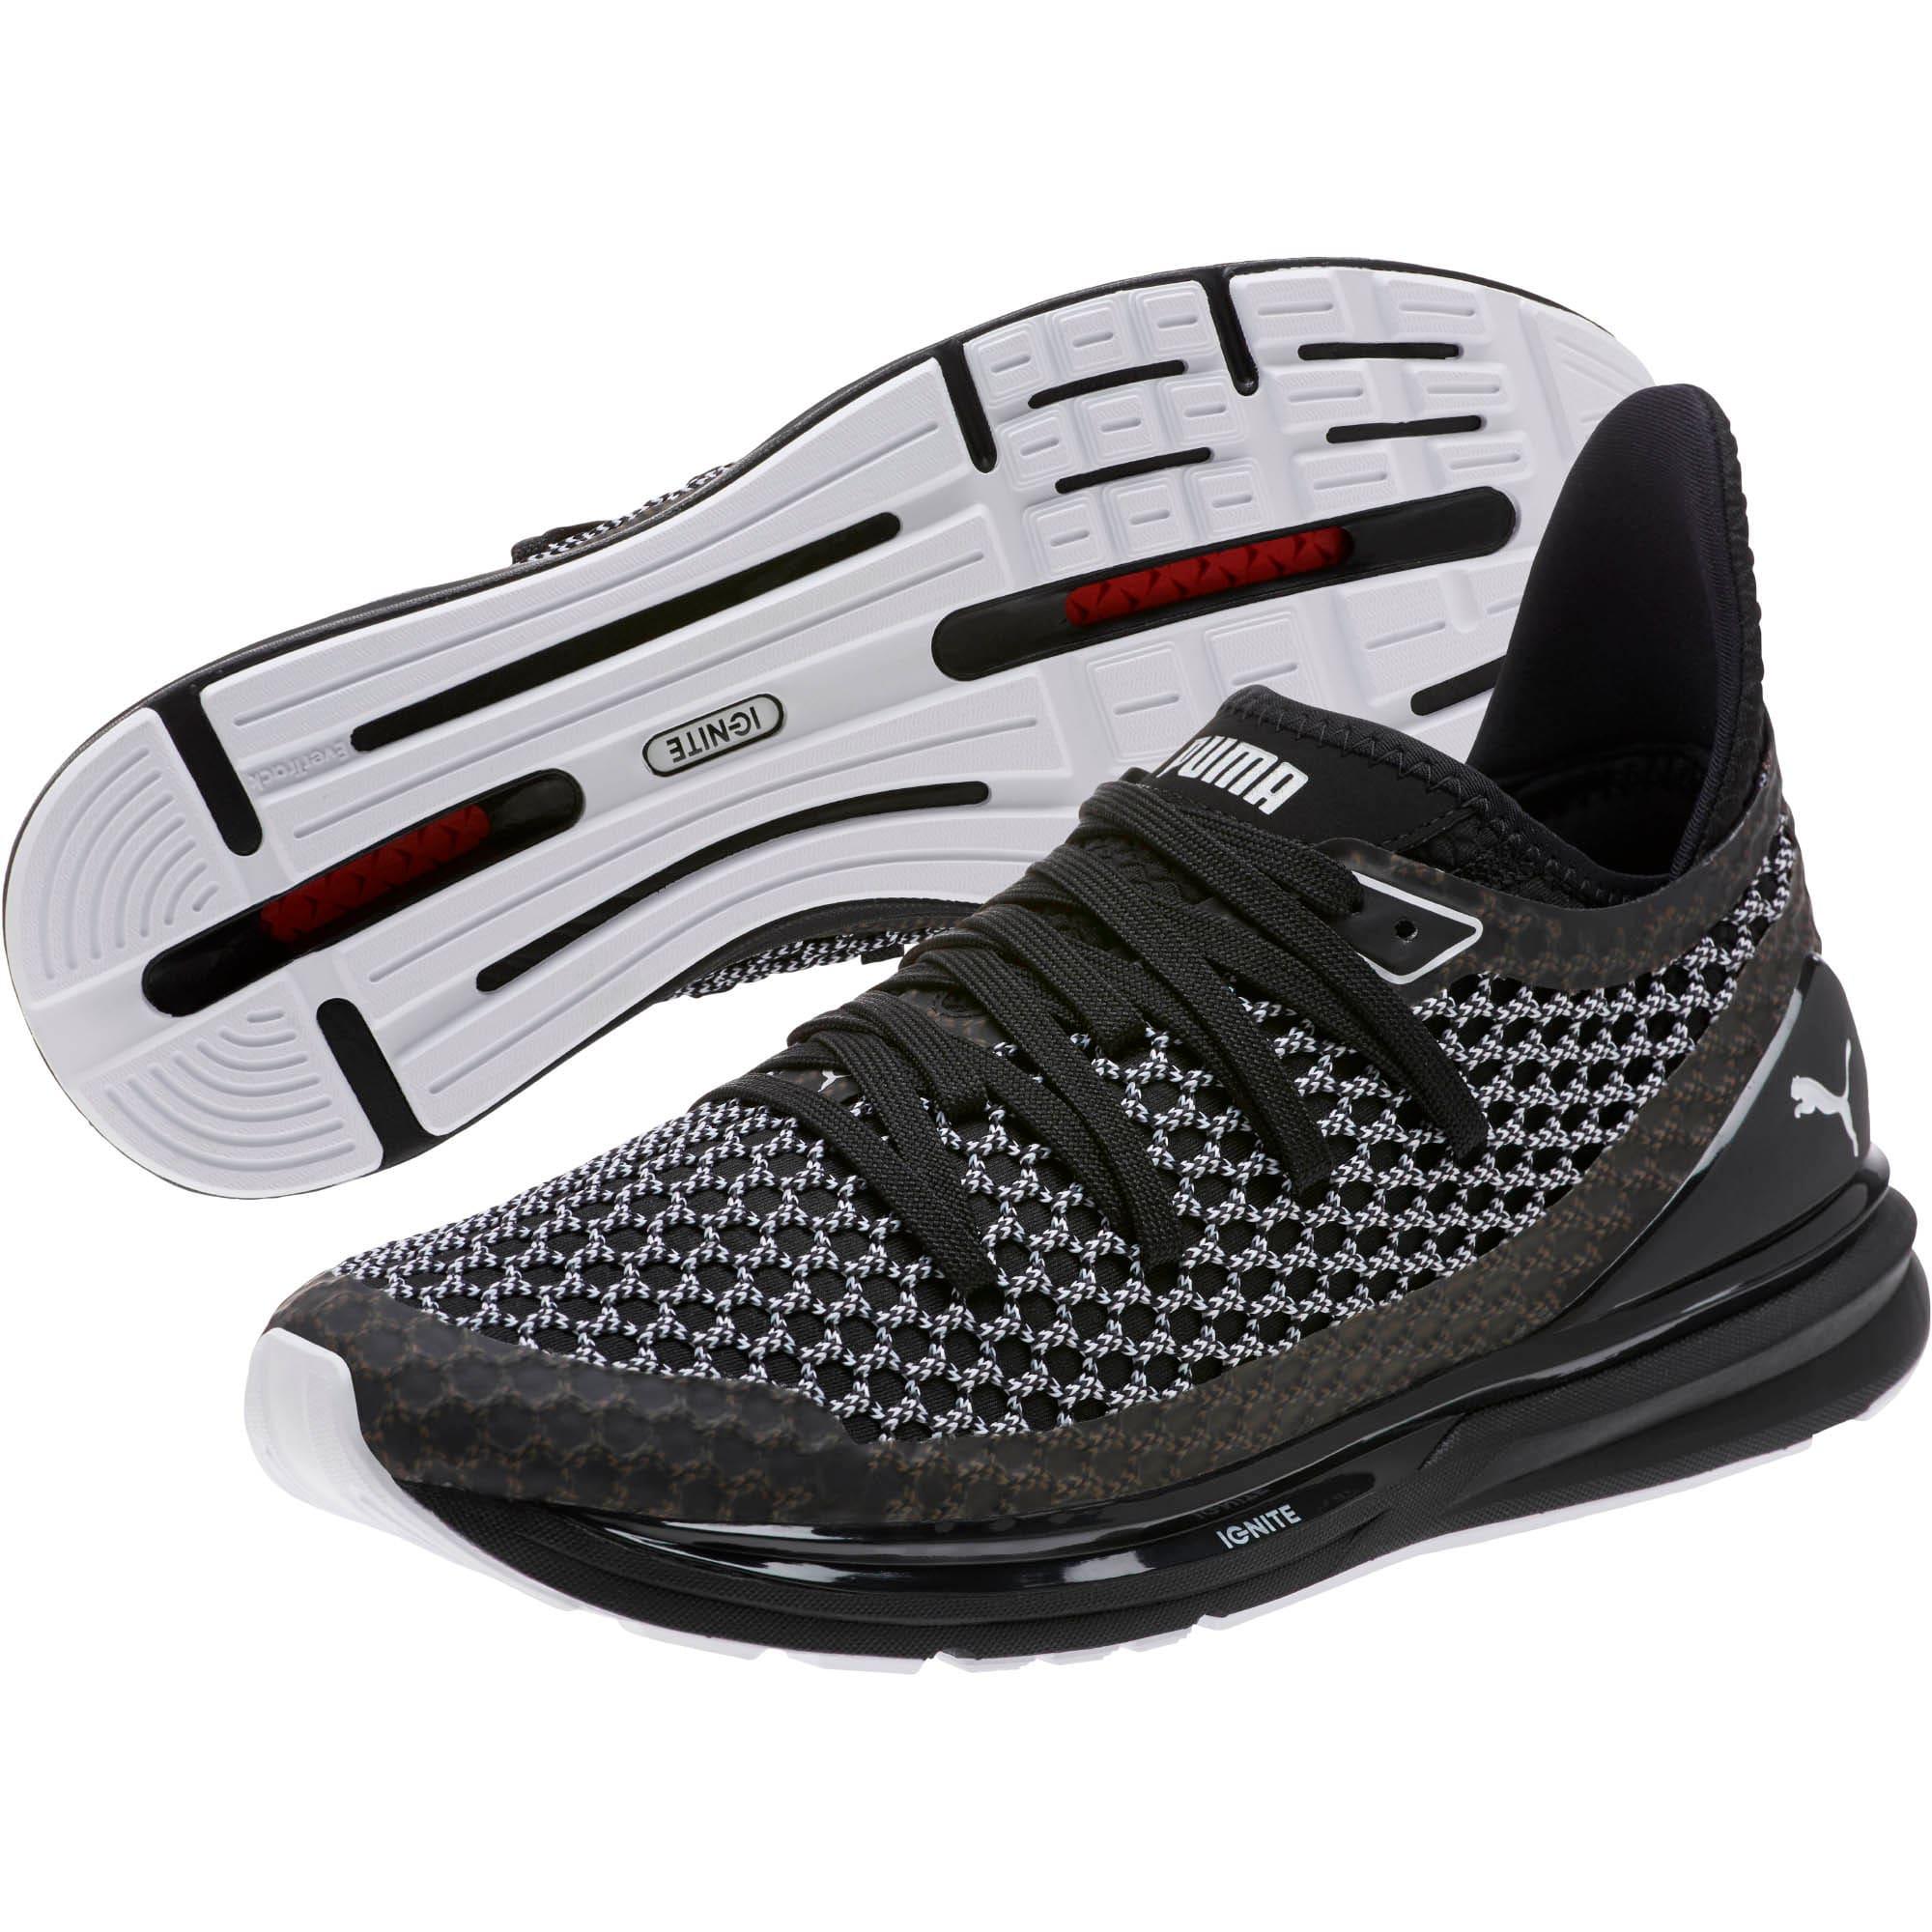 Thumbnail 2 of IGNITE Limitless NETFIT Multi Sneakers, Puma Black-Puma White, medium